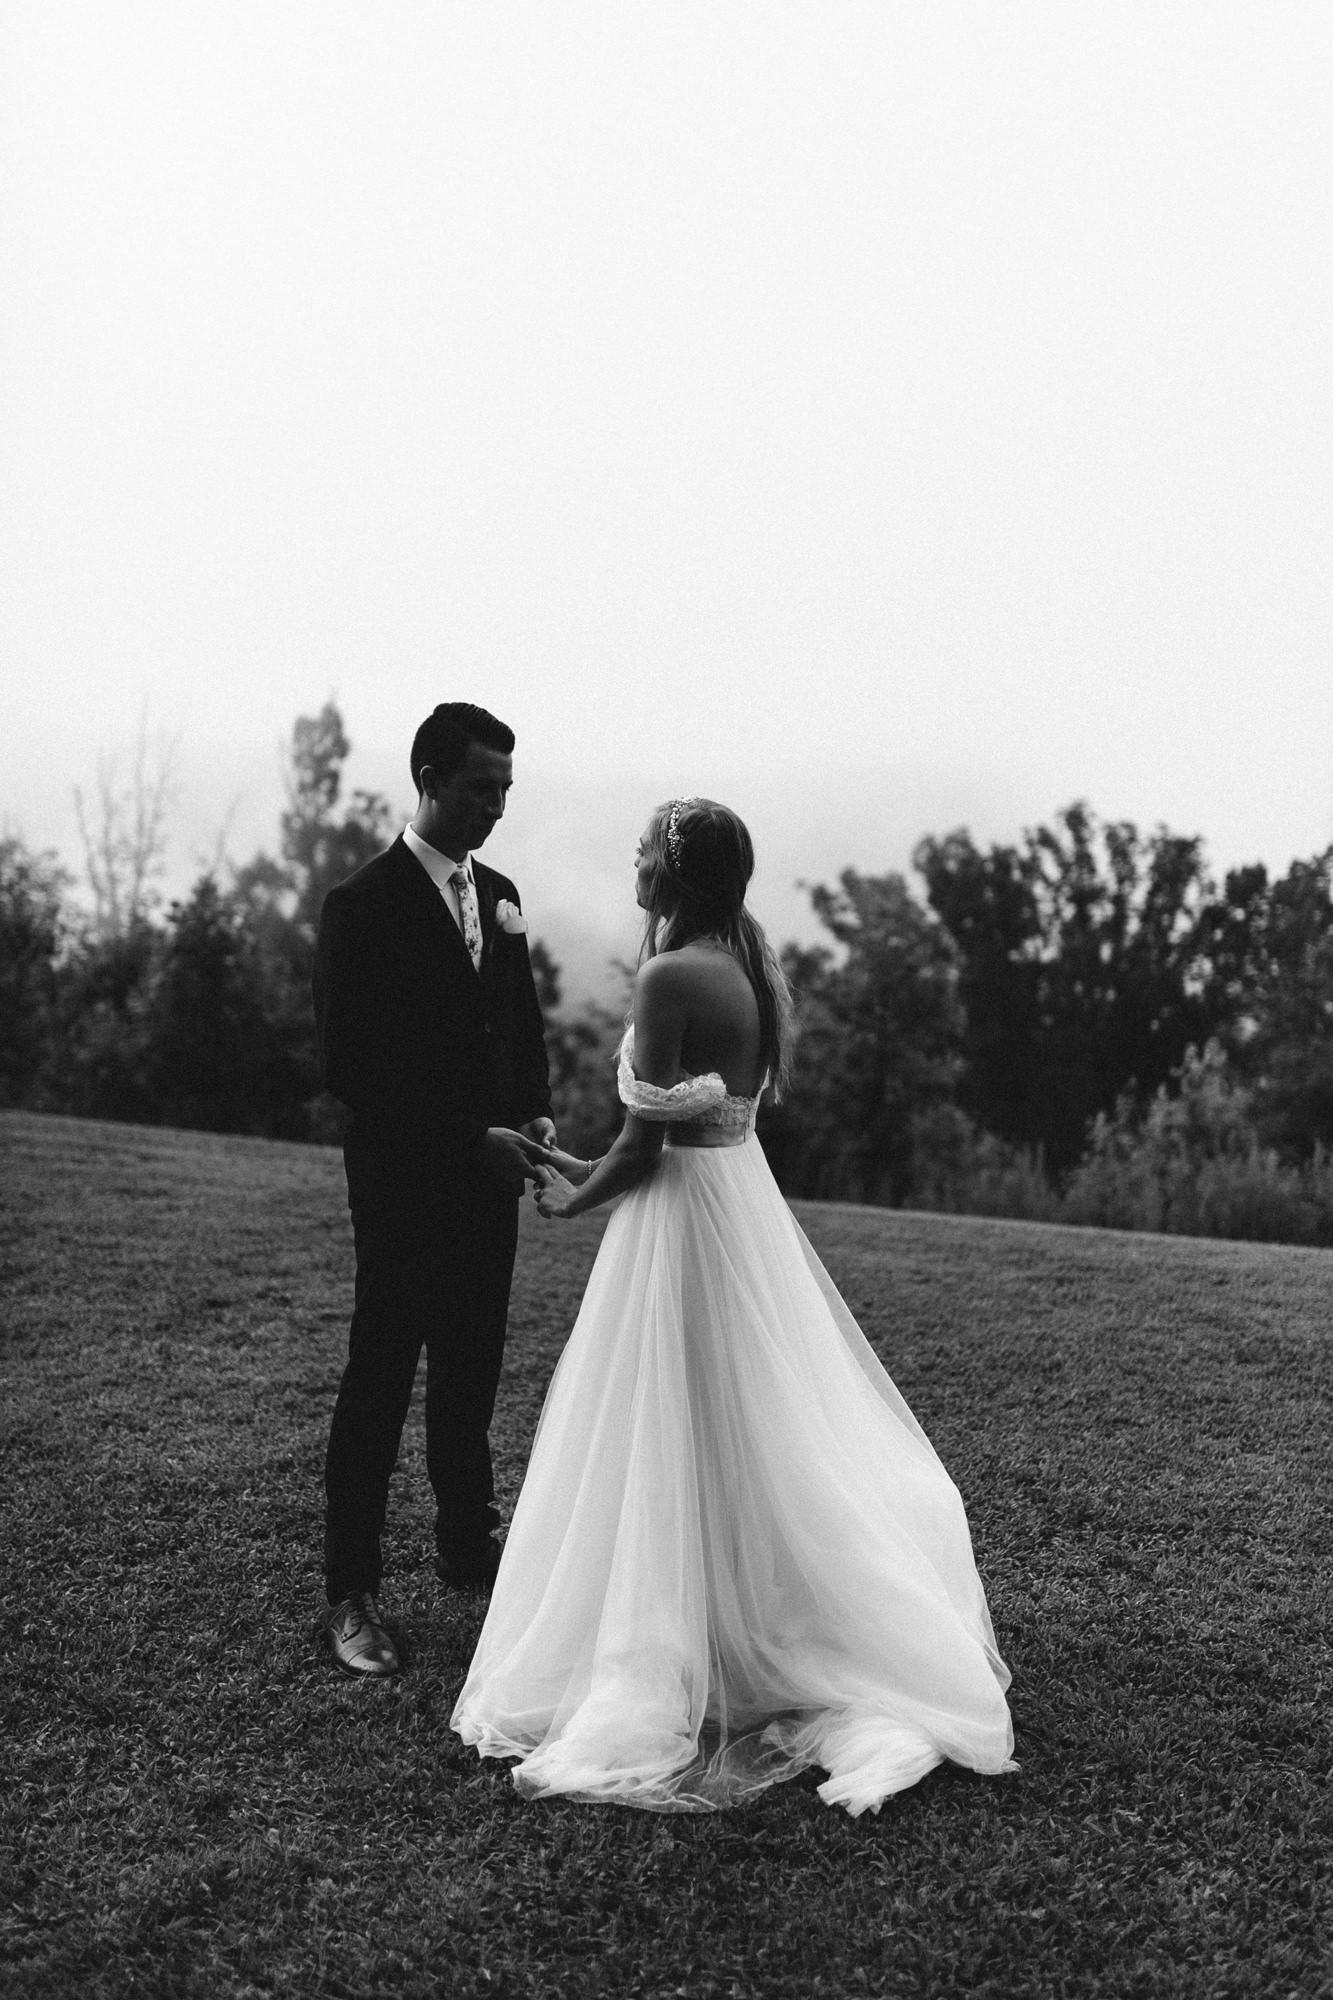 nashville_tennessee_wedding_photographer-132.jpg